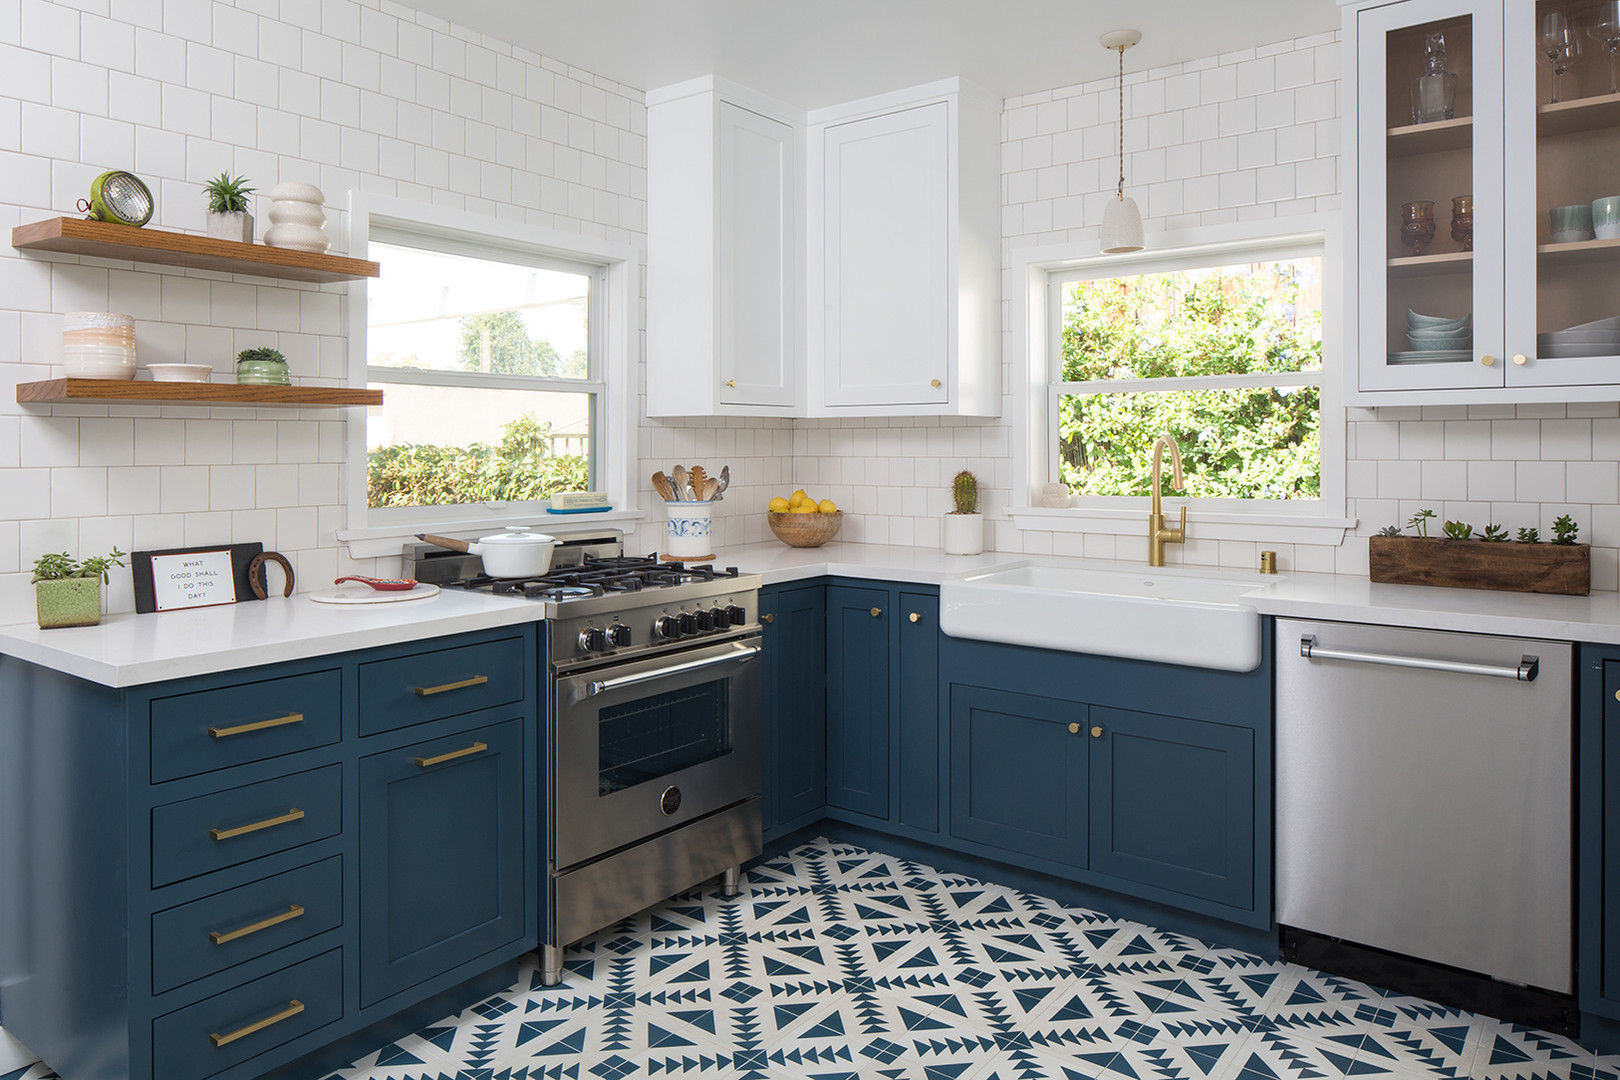 Kelly-Martin-Interiors_Geer-Kitchen_Angl